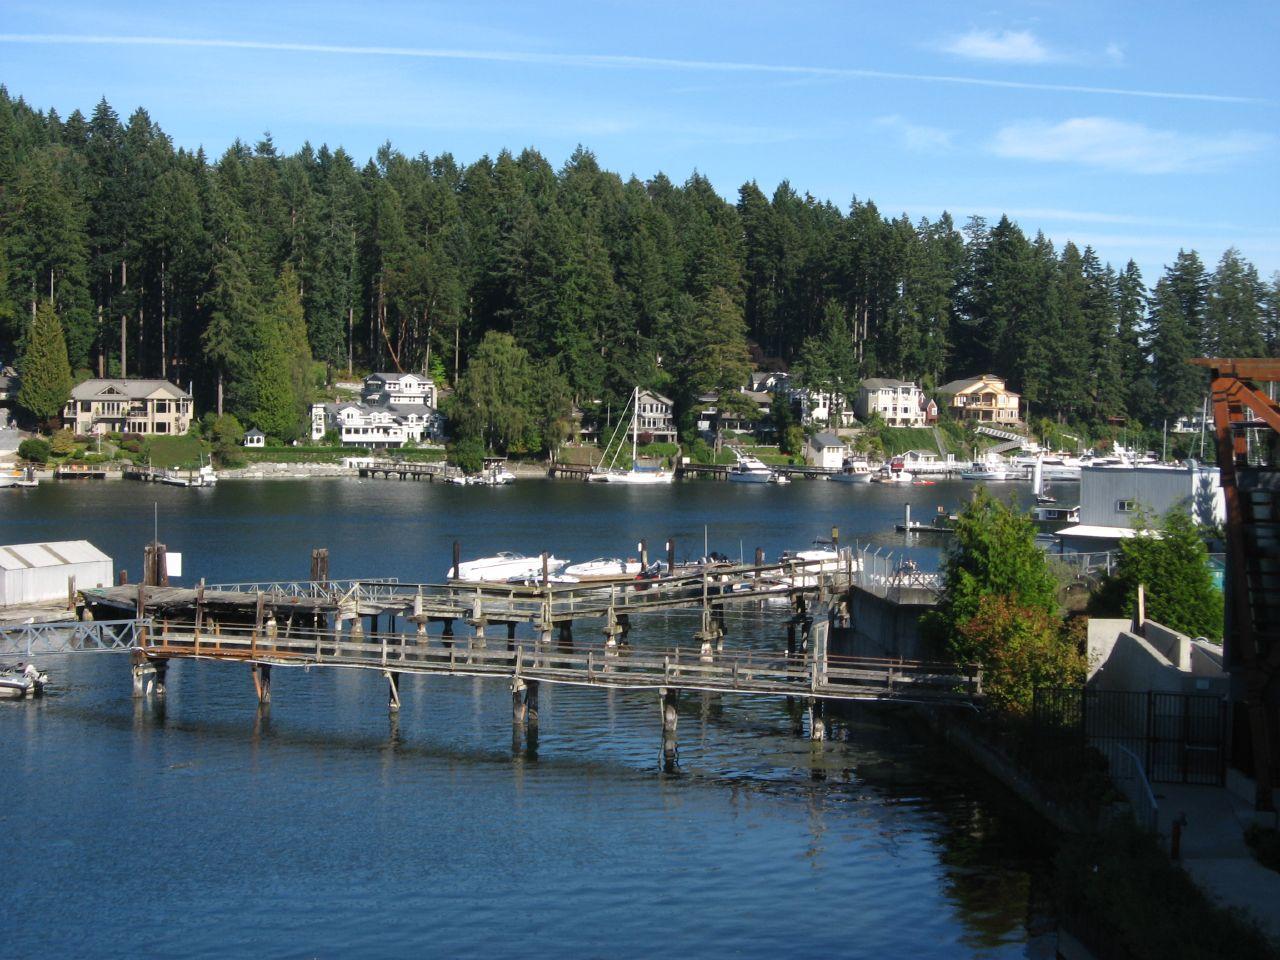 Gig harbor physical therapy - About Gig Harbor Washington